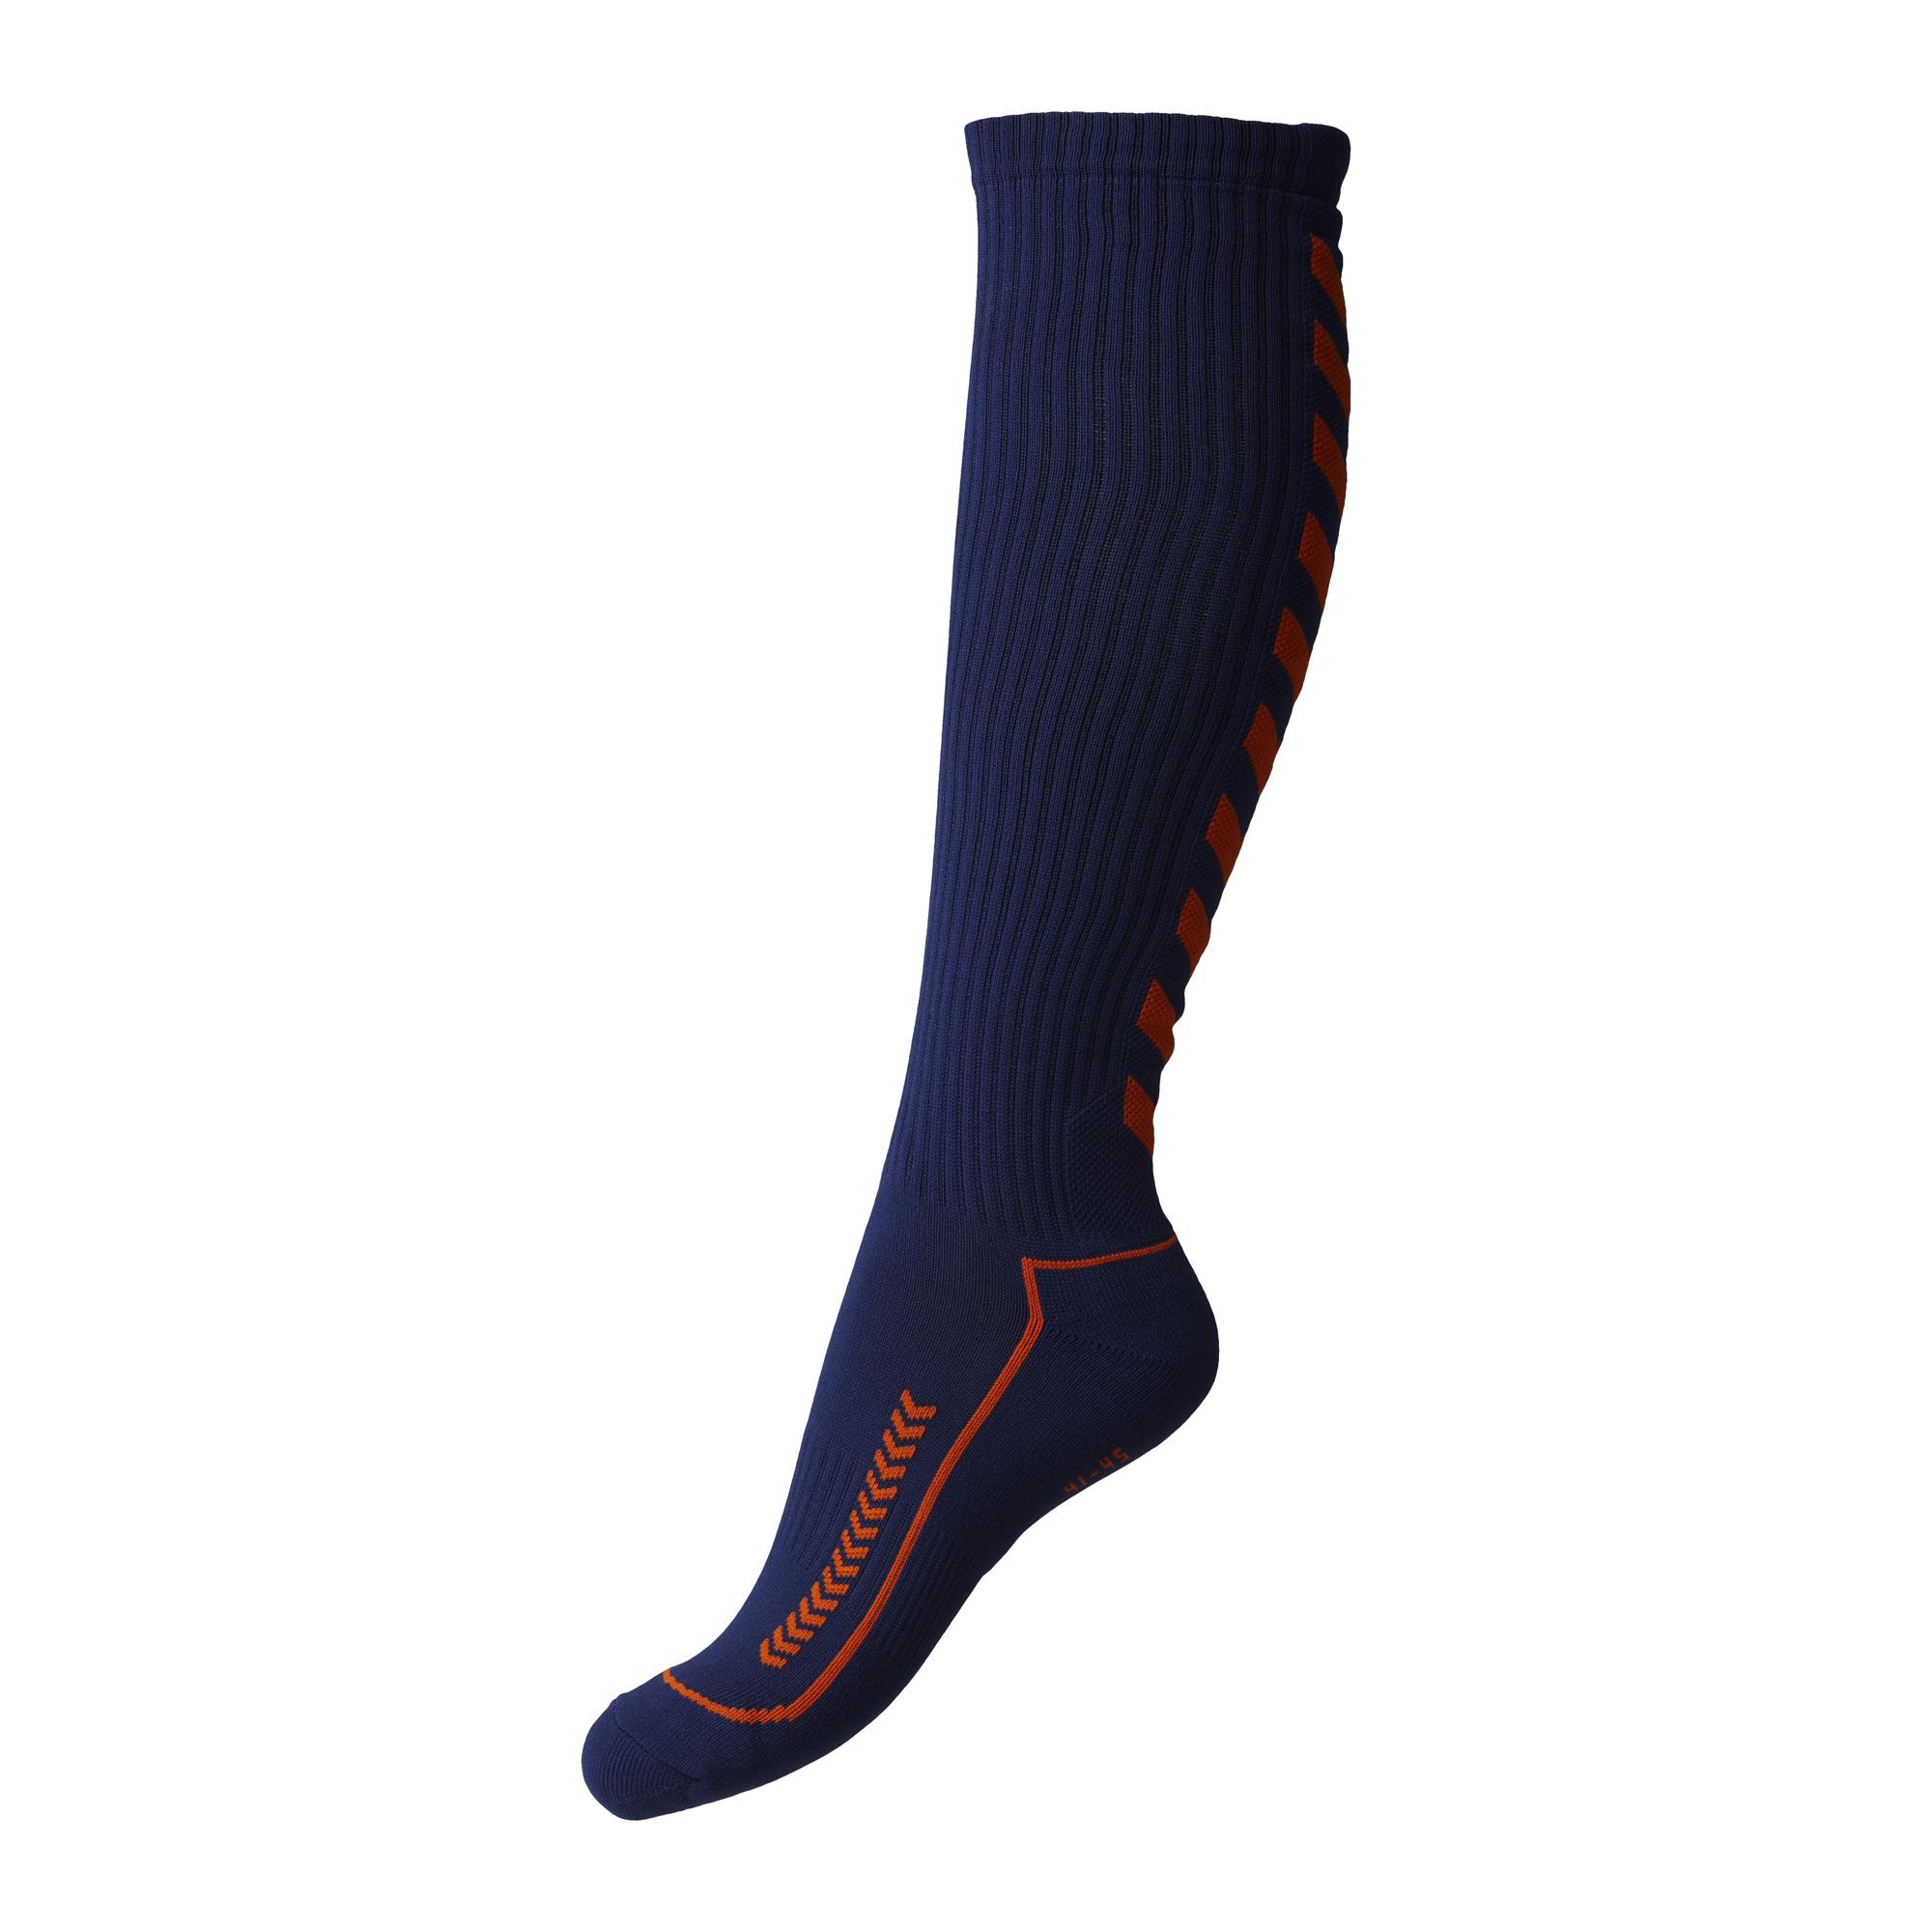 Hummel Advanced Long Indoor Sock 21059-7684 32-35